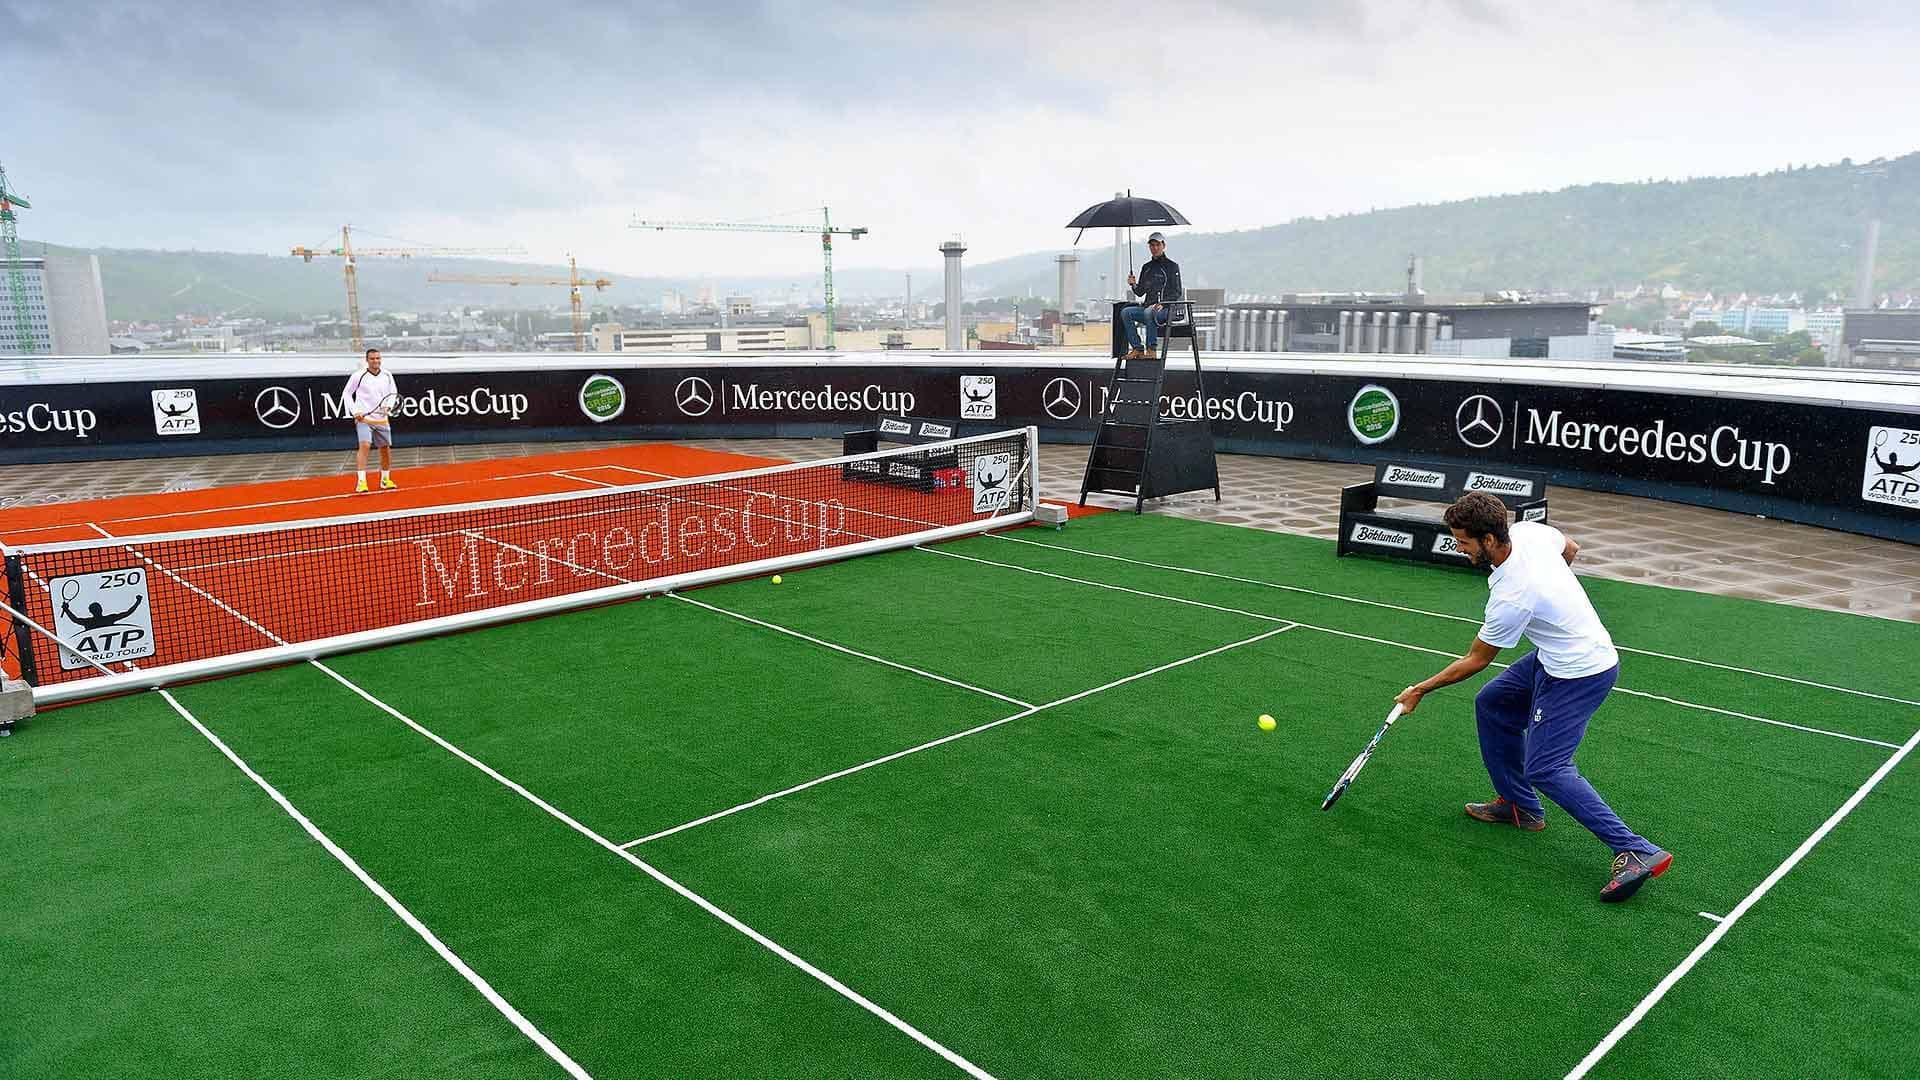 Stuttgart  Photo Gallery Atpworldtour Com Atp World Tour Tennis